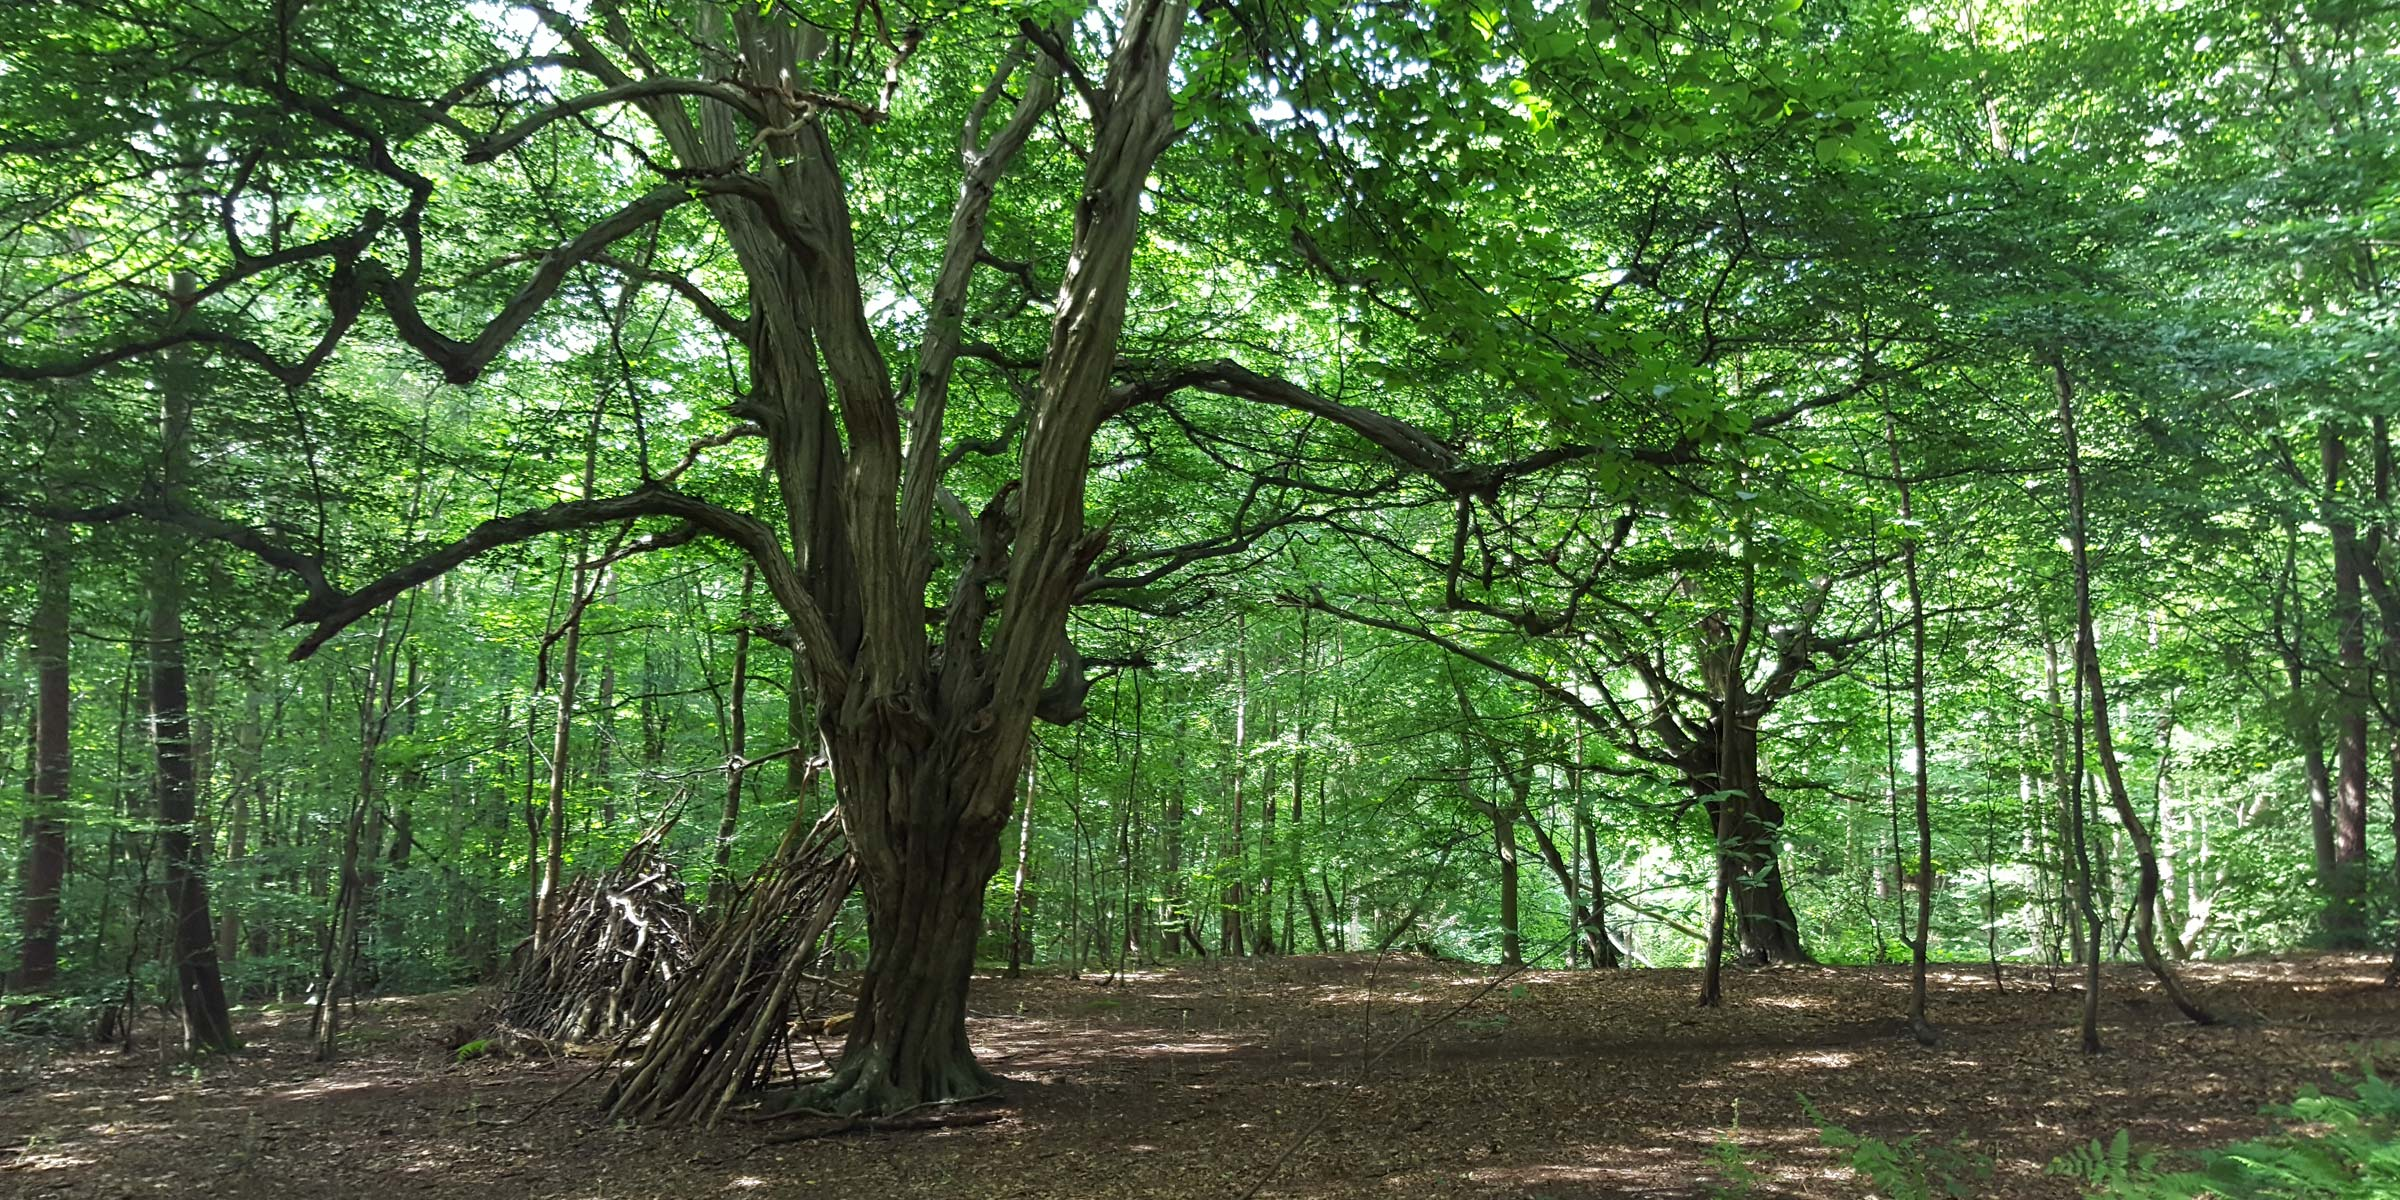 Arboriculture & Landscape Management